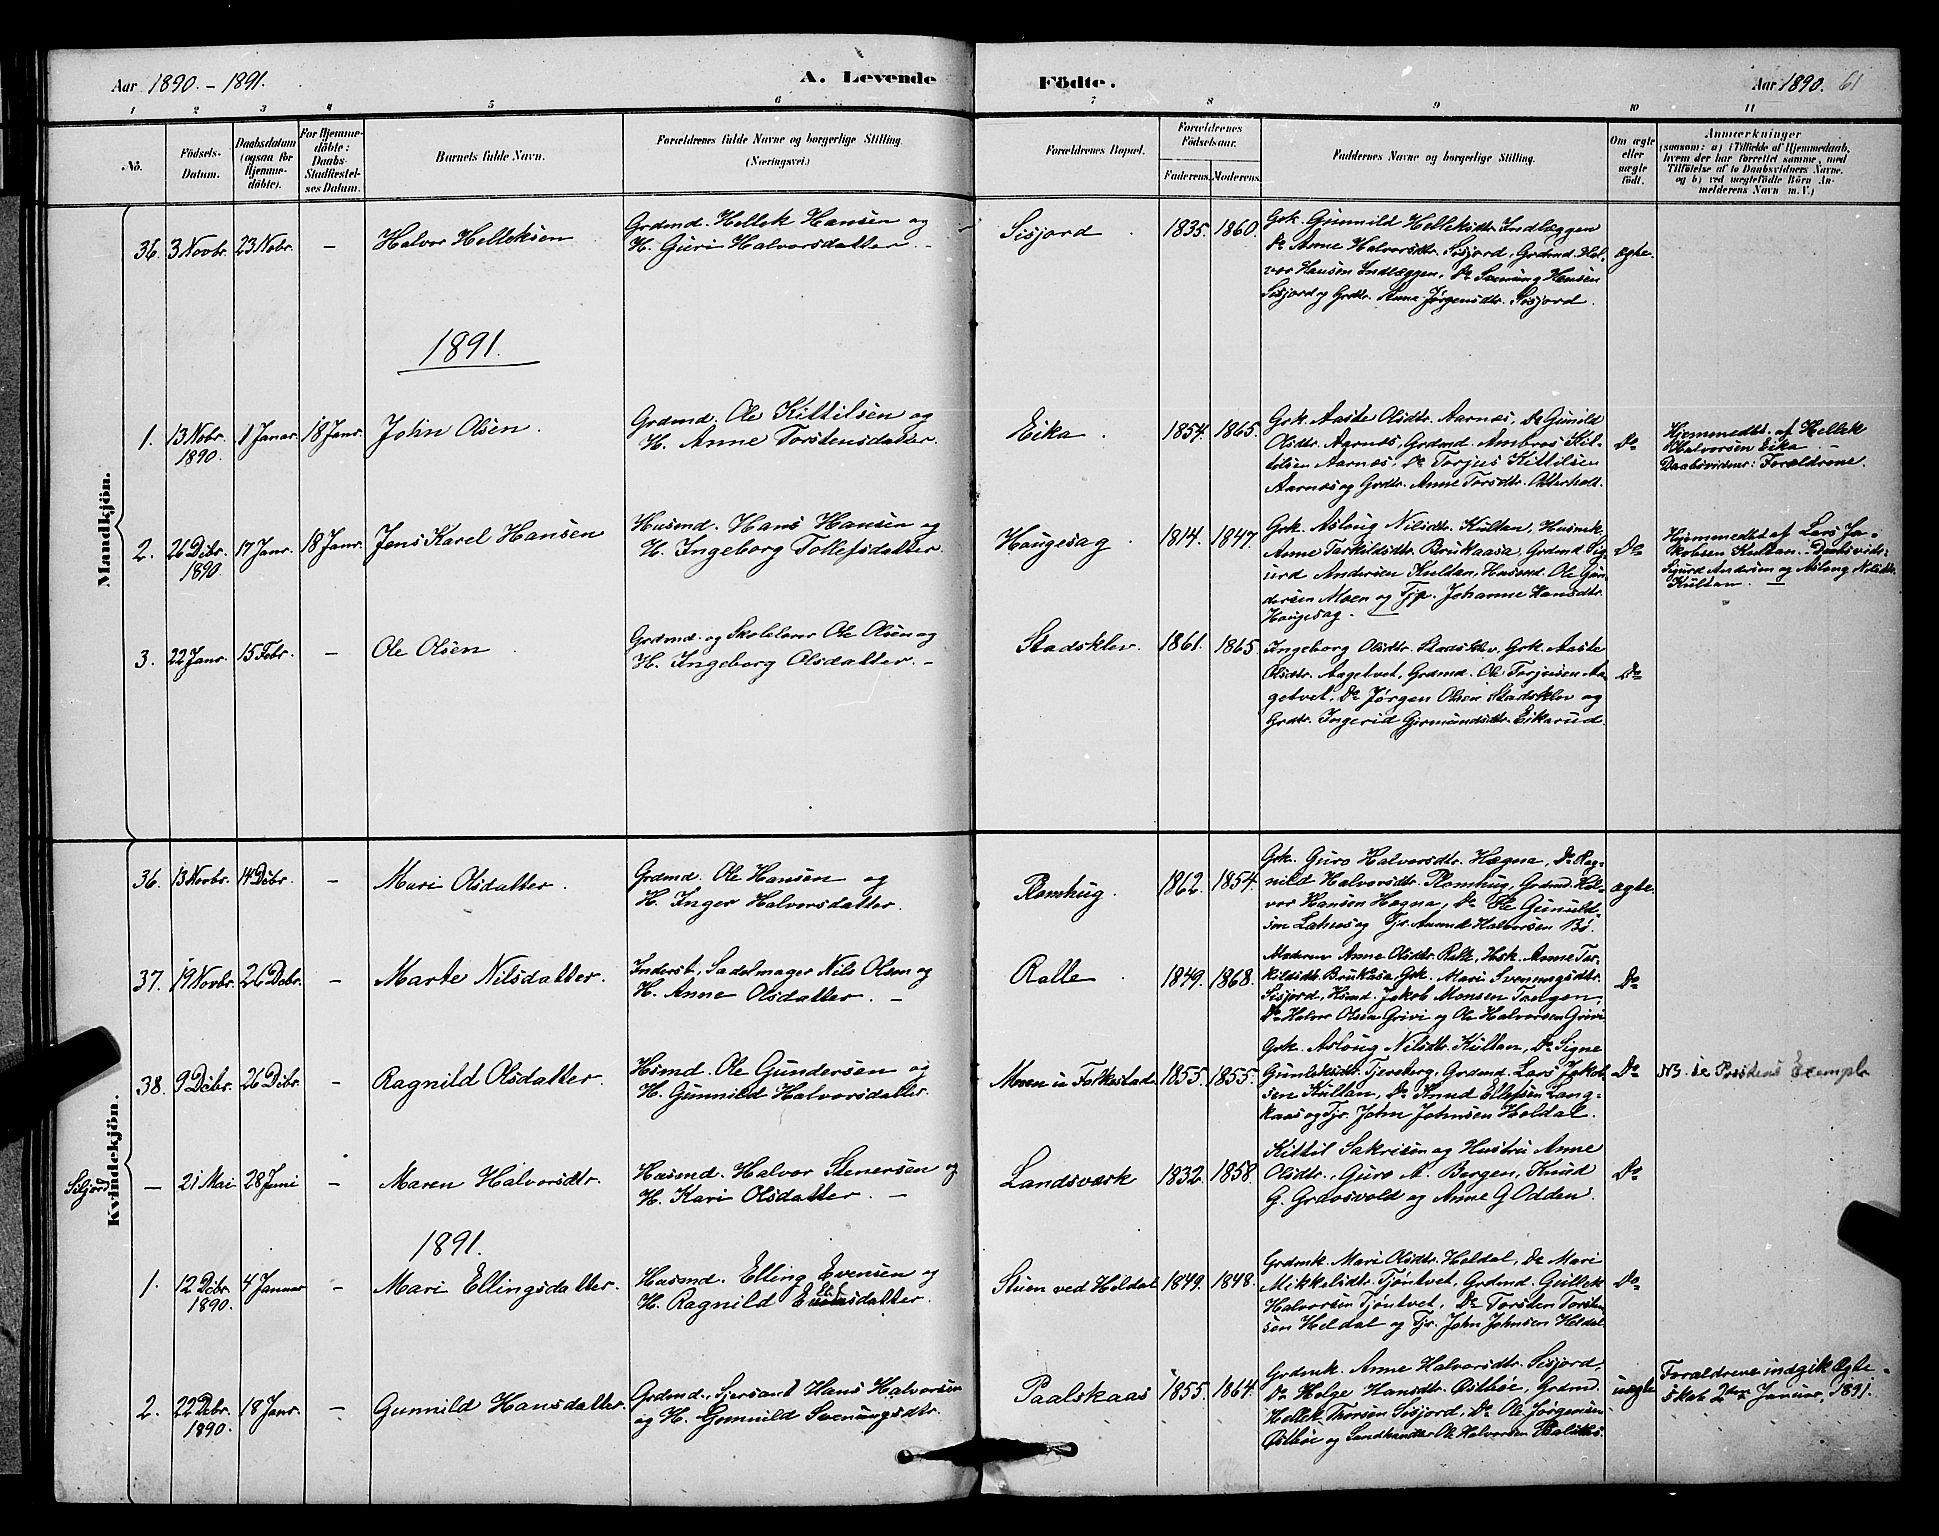 SAKO, Bø kirkebøker, G/Ga/L0005: Klokkerbok nr. 5, 1883-1897, s. 61